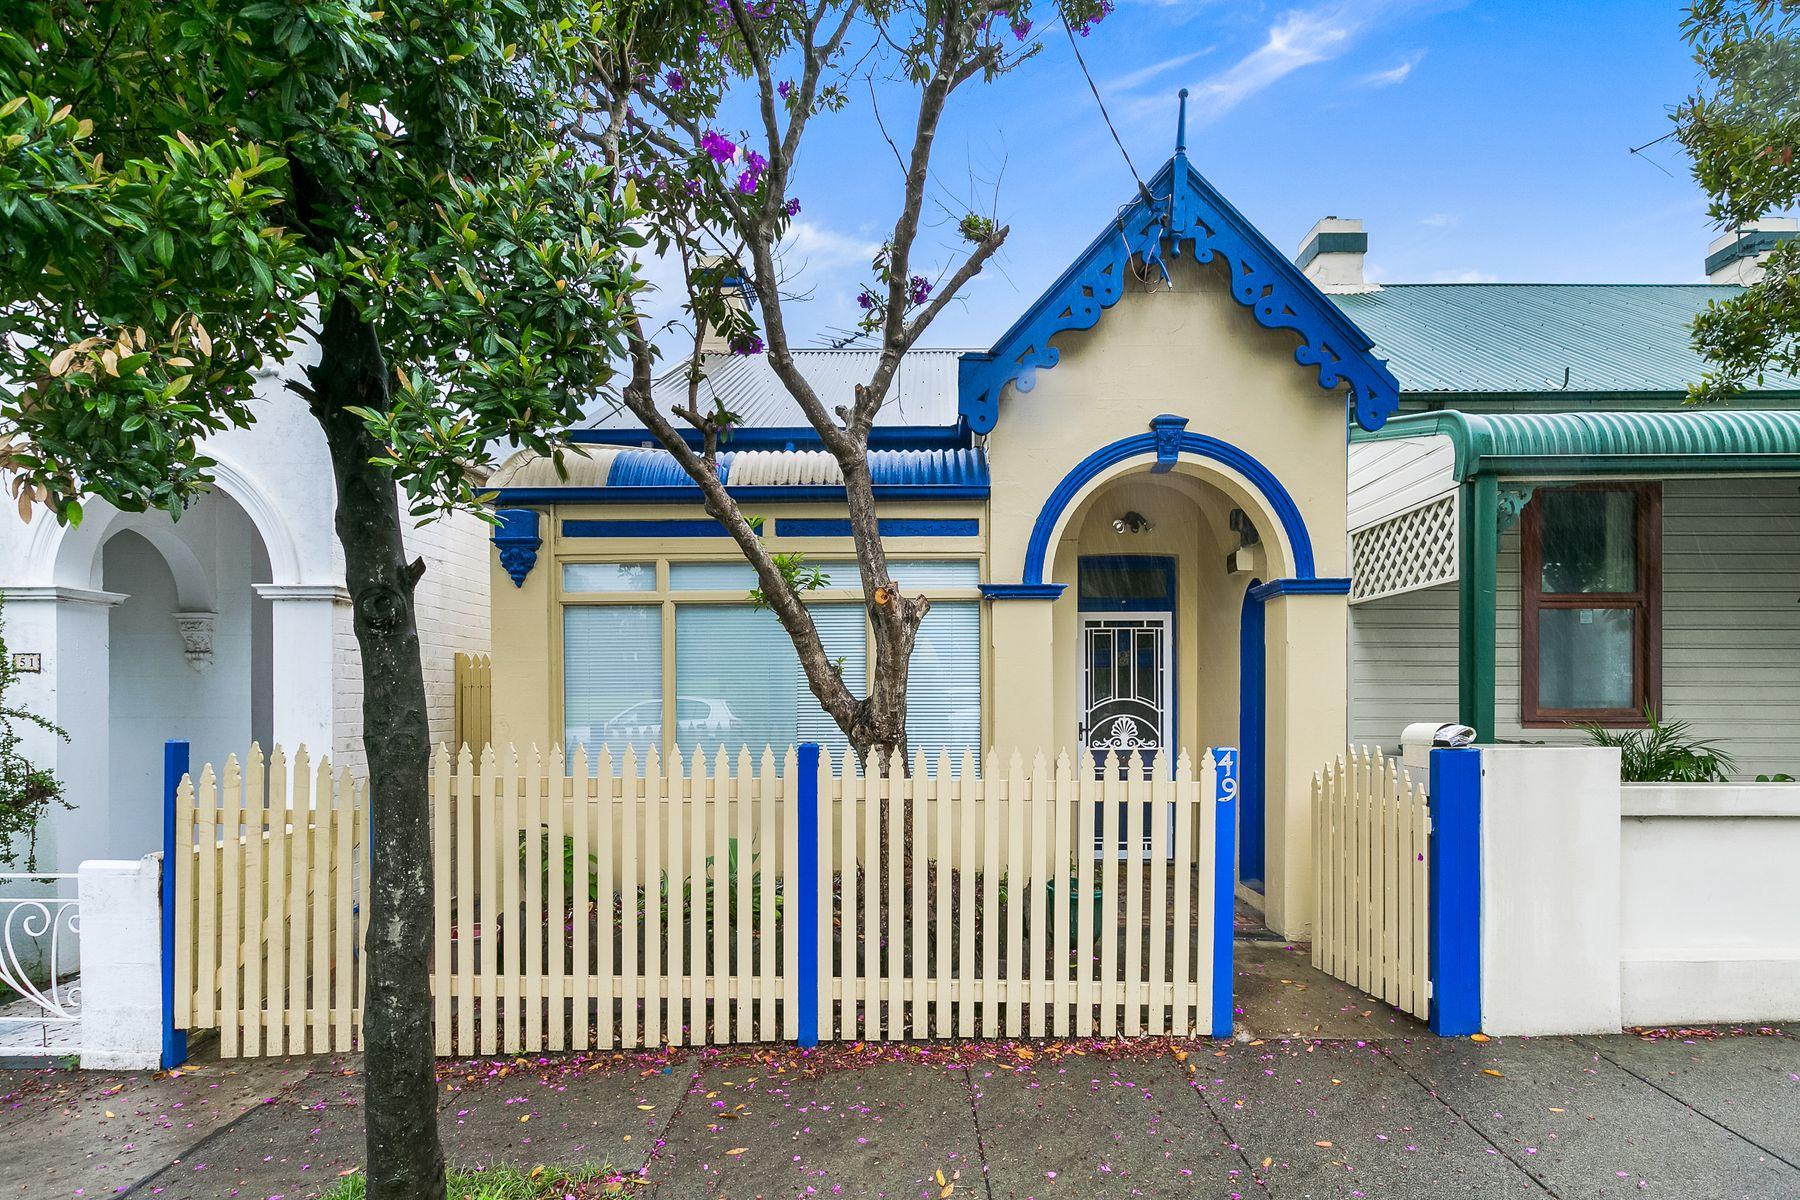 49 George street, Sydenham, NSW 2044